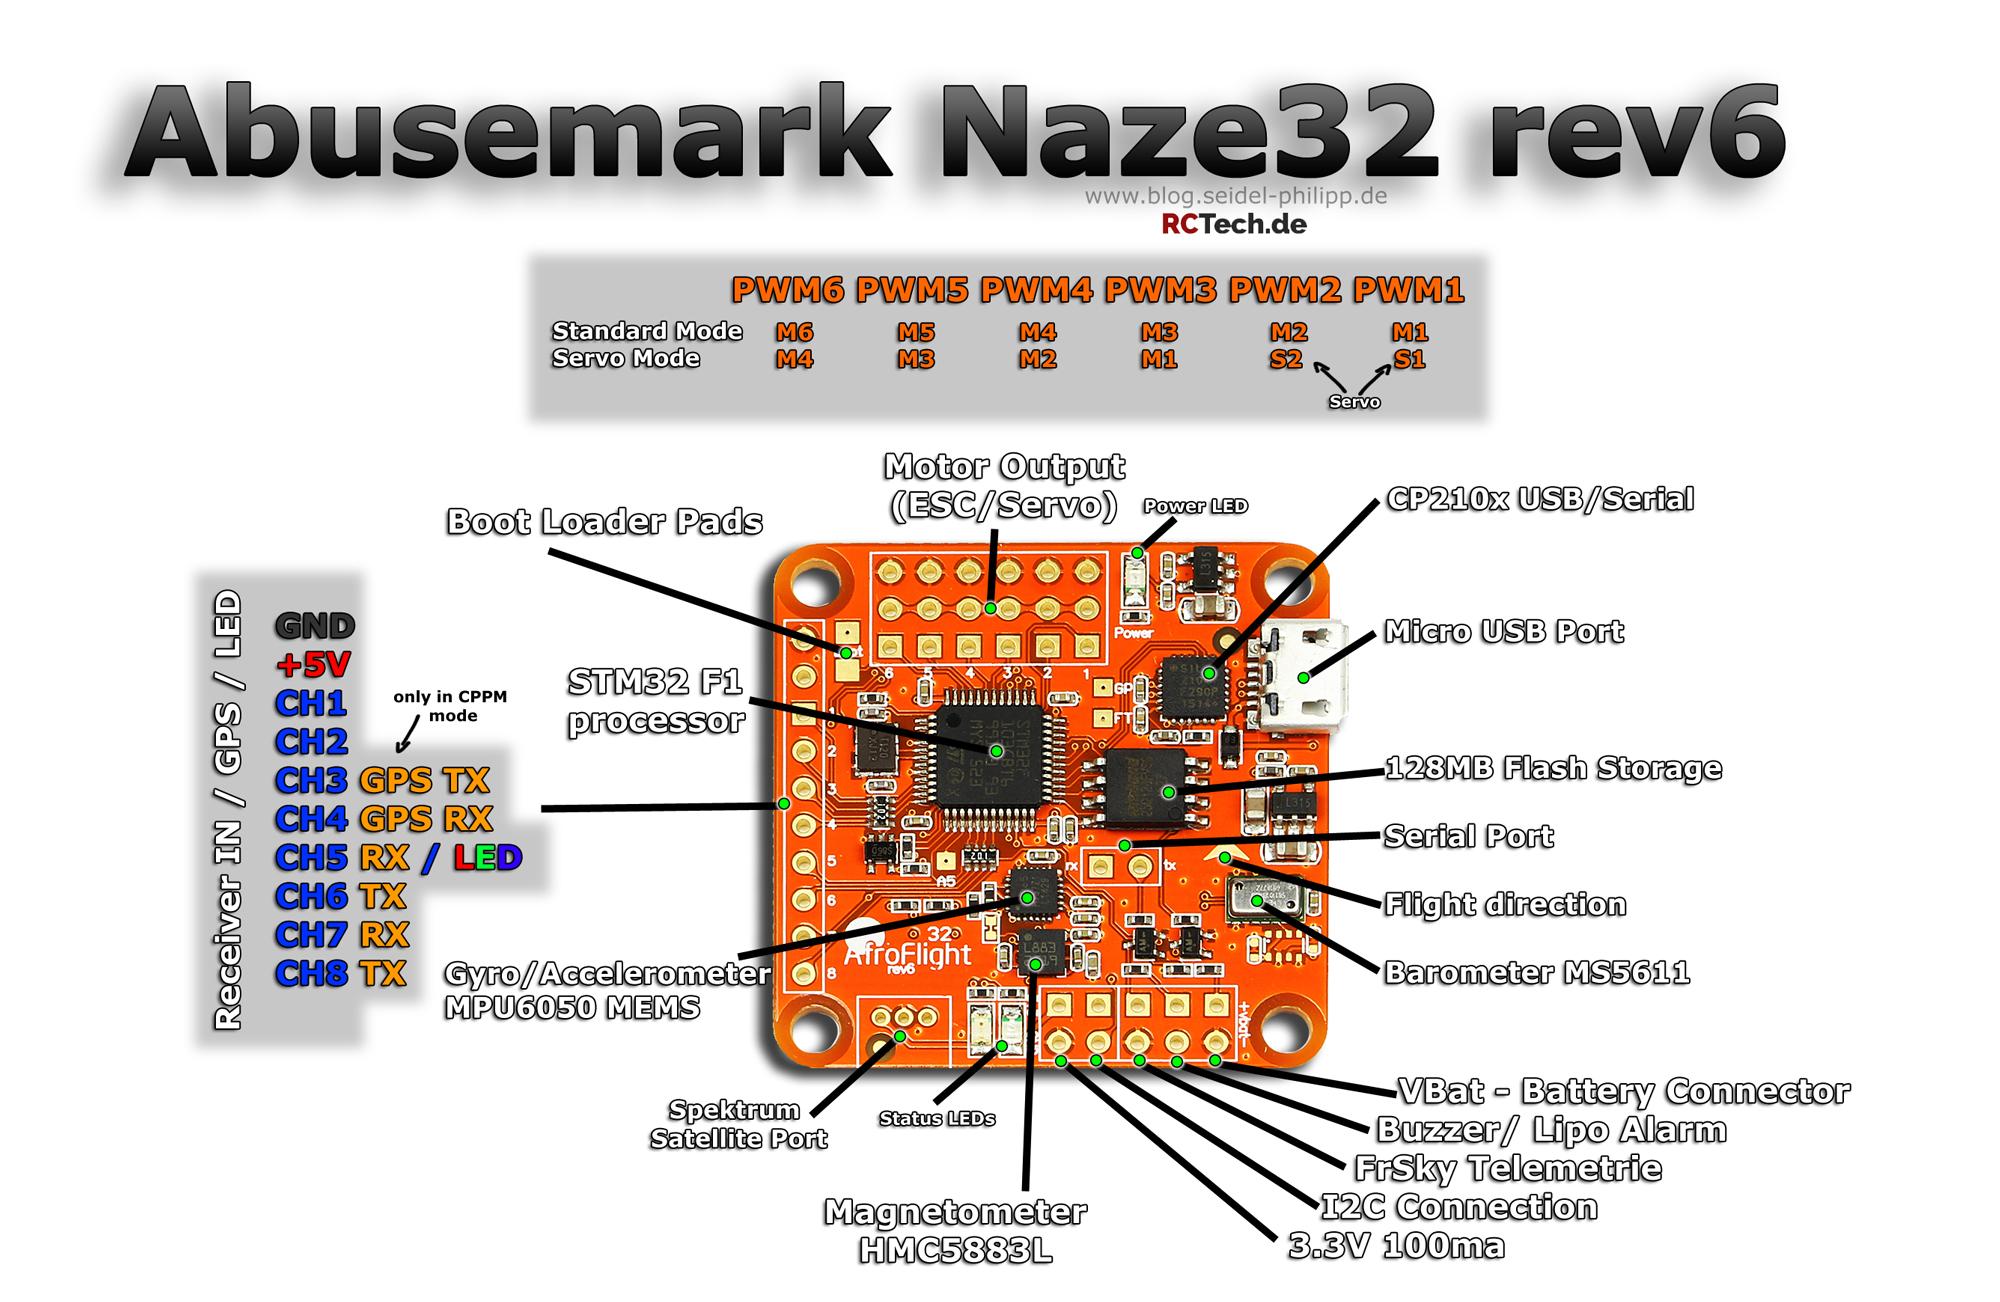 abusemark naze32 rev6 pin layout und anschlussplan naze32 rev5 diagram naze32 rev6 pinlayout